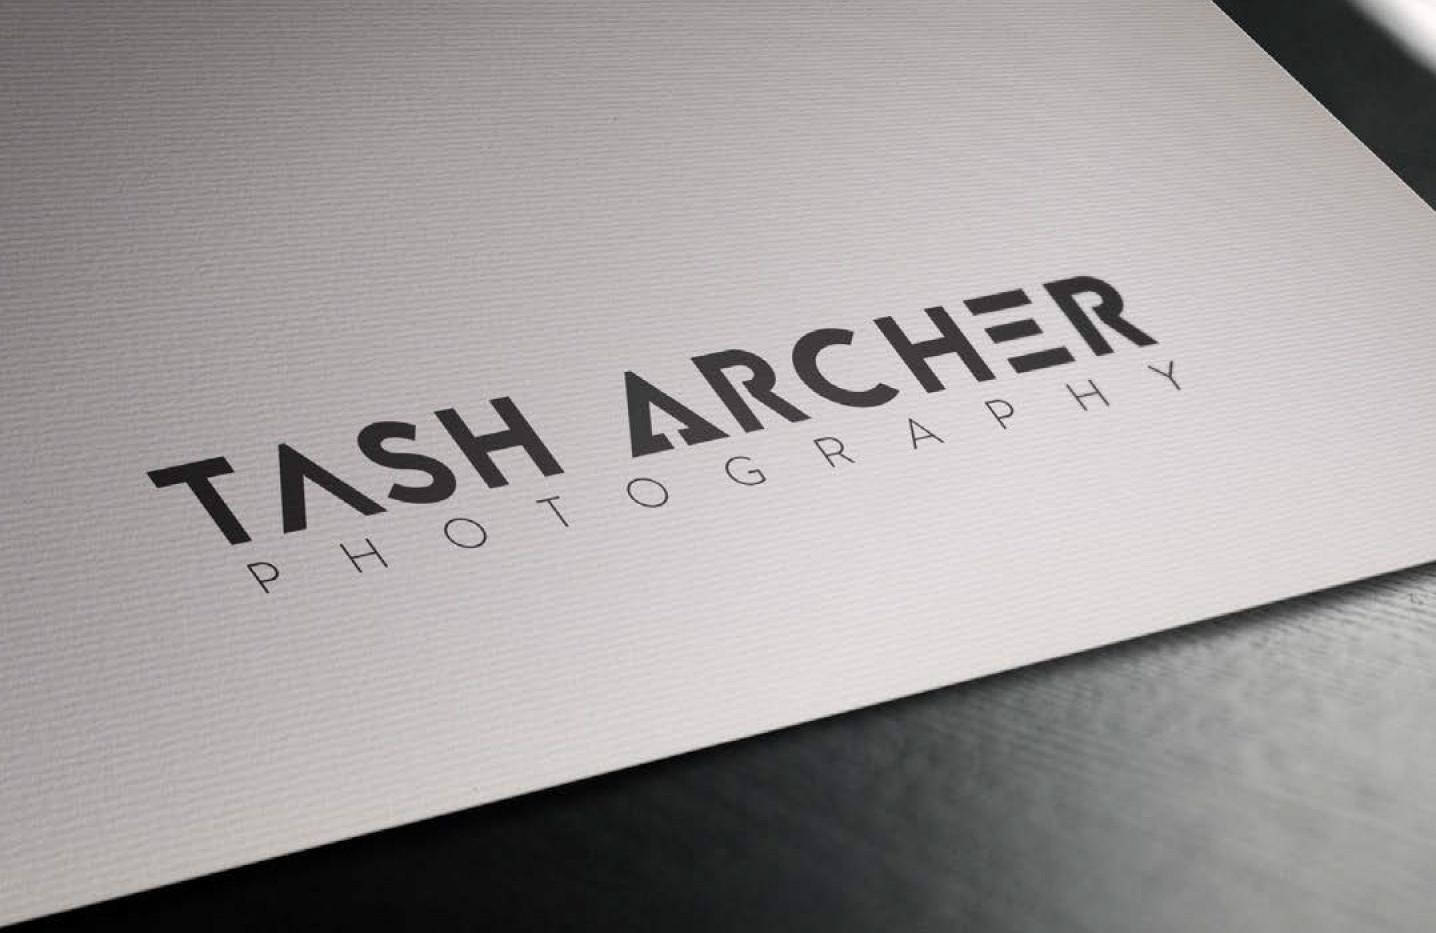 TashArcherPhotography-1.jpg